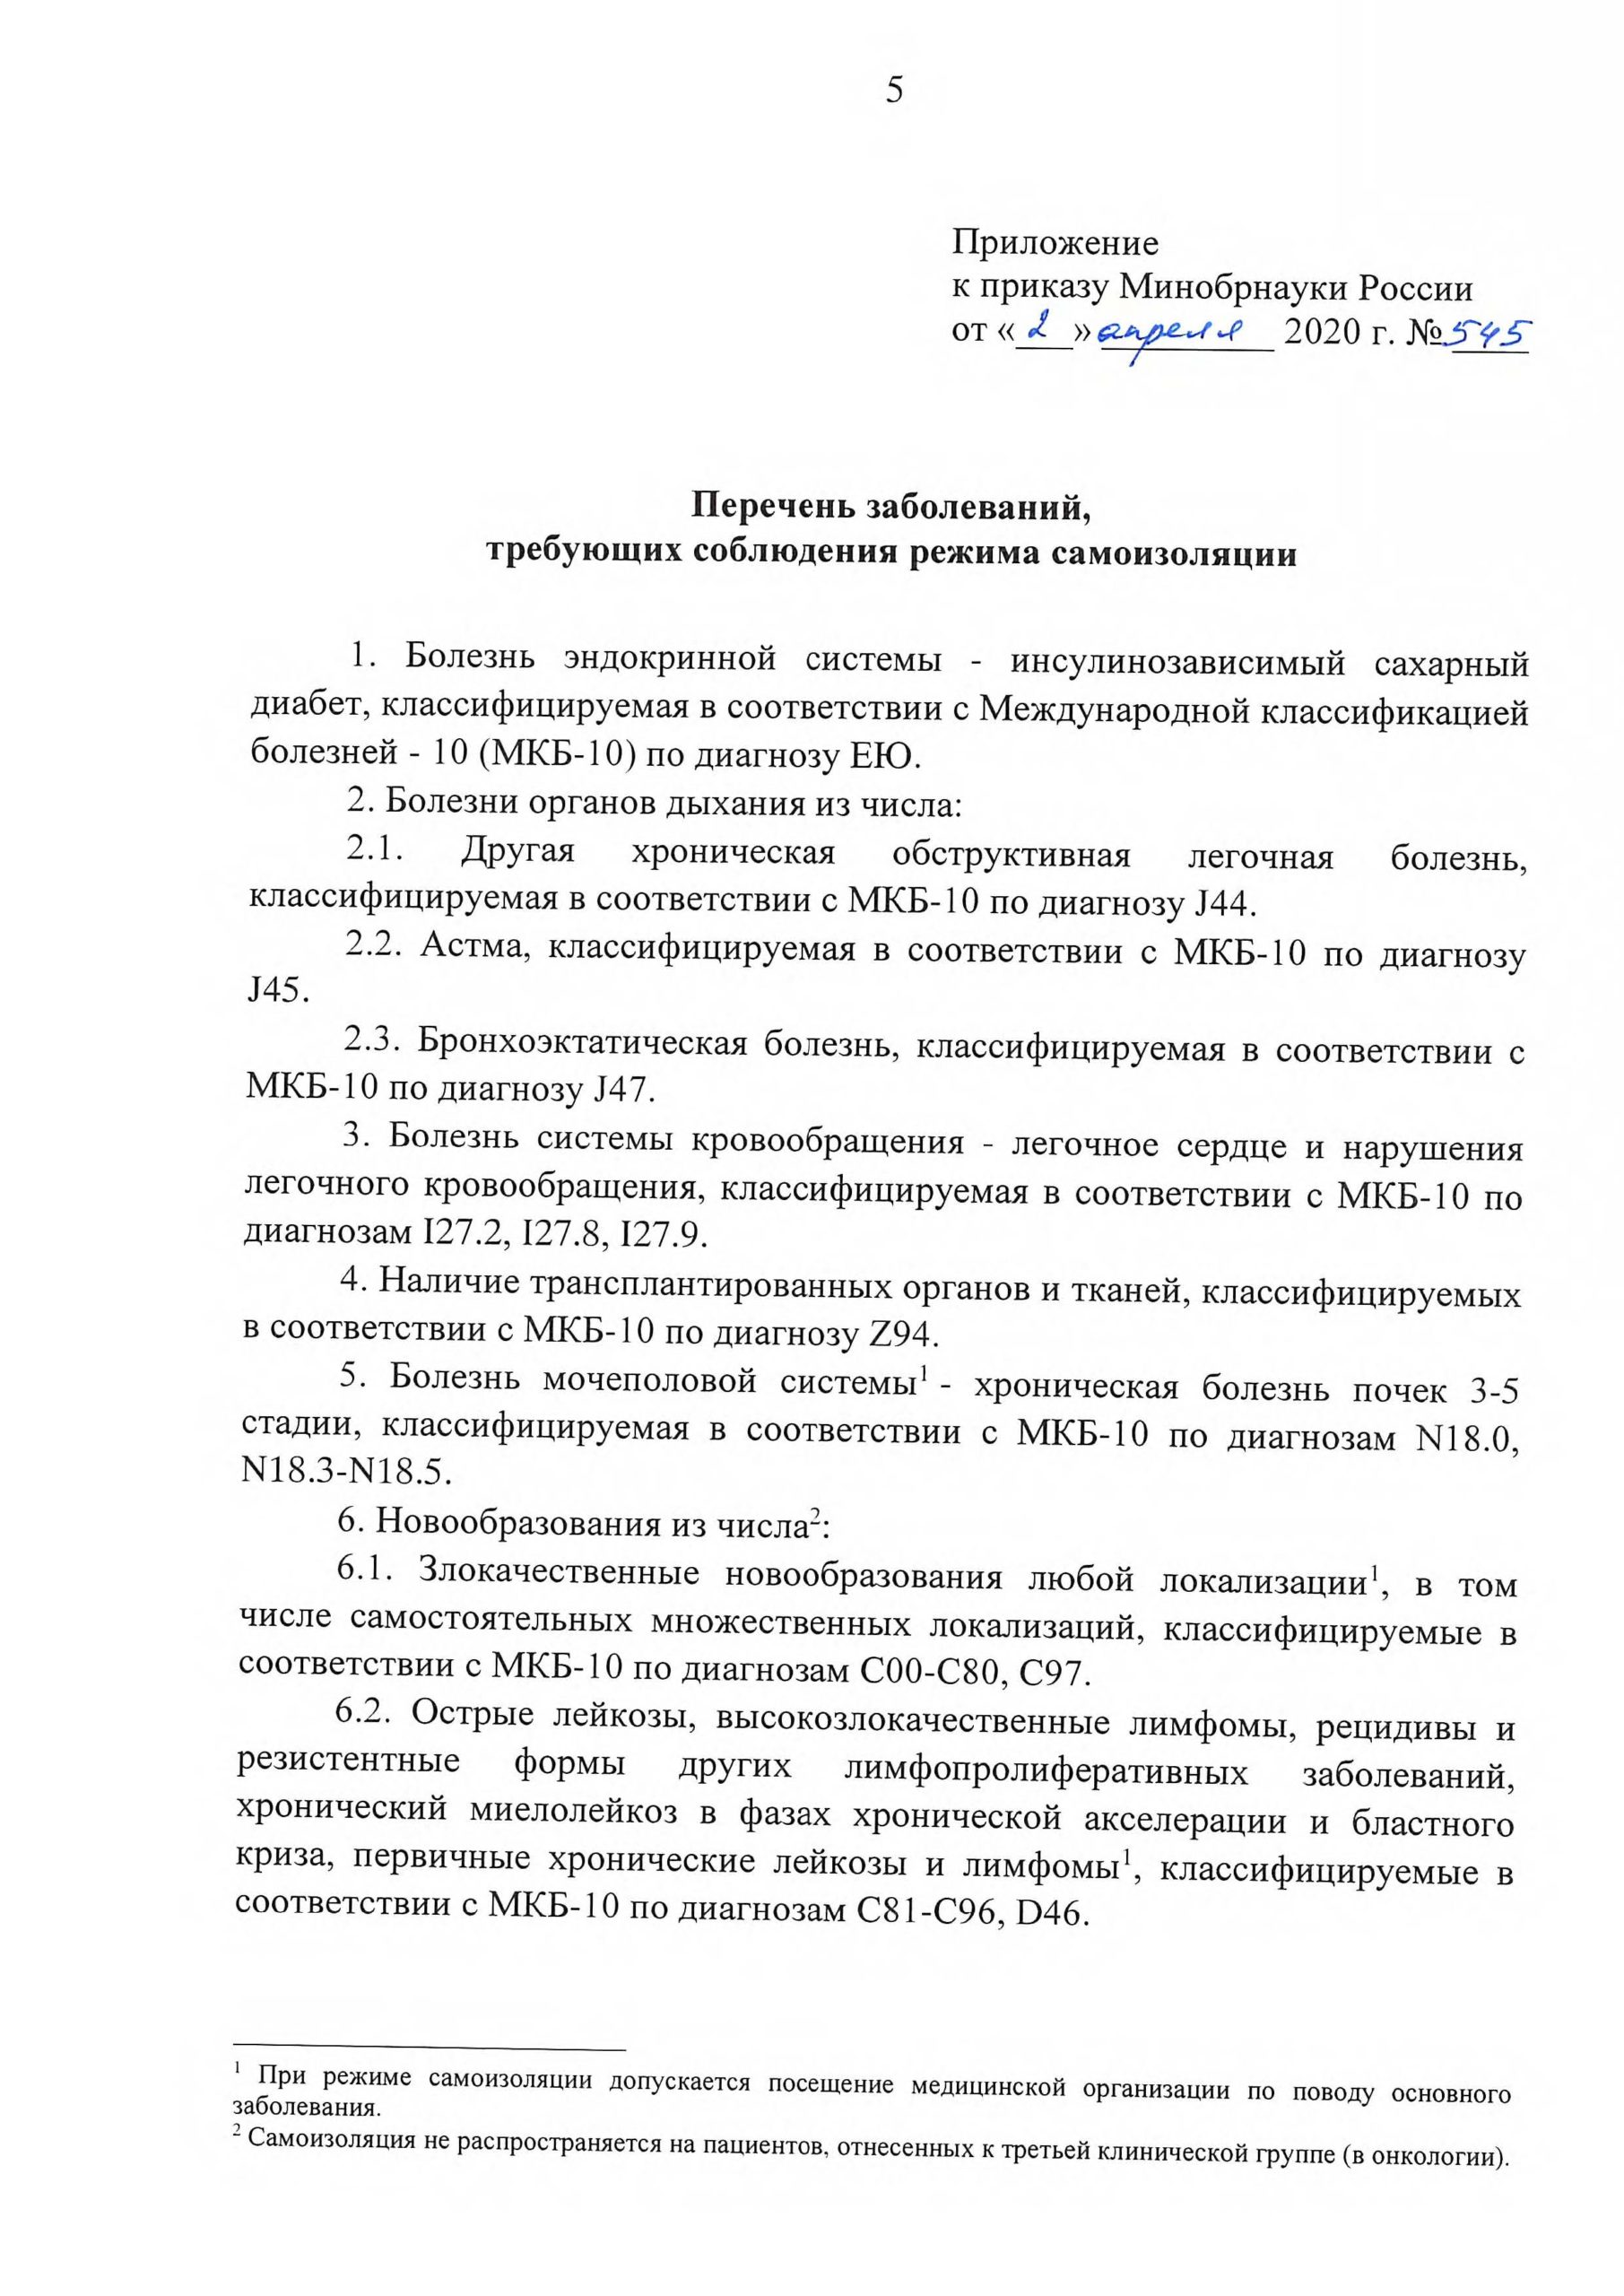 2020.04.02_prikaz_545_Falkov_V..pdf_Страница_5